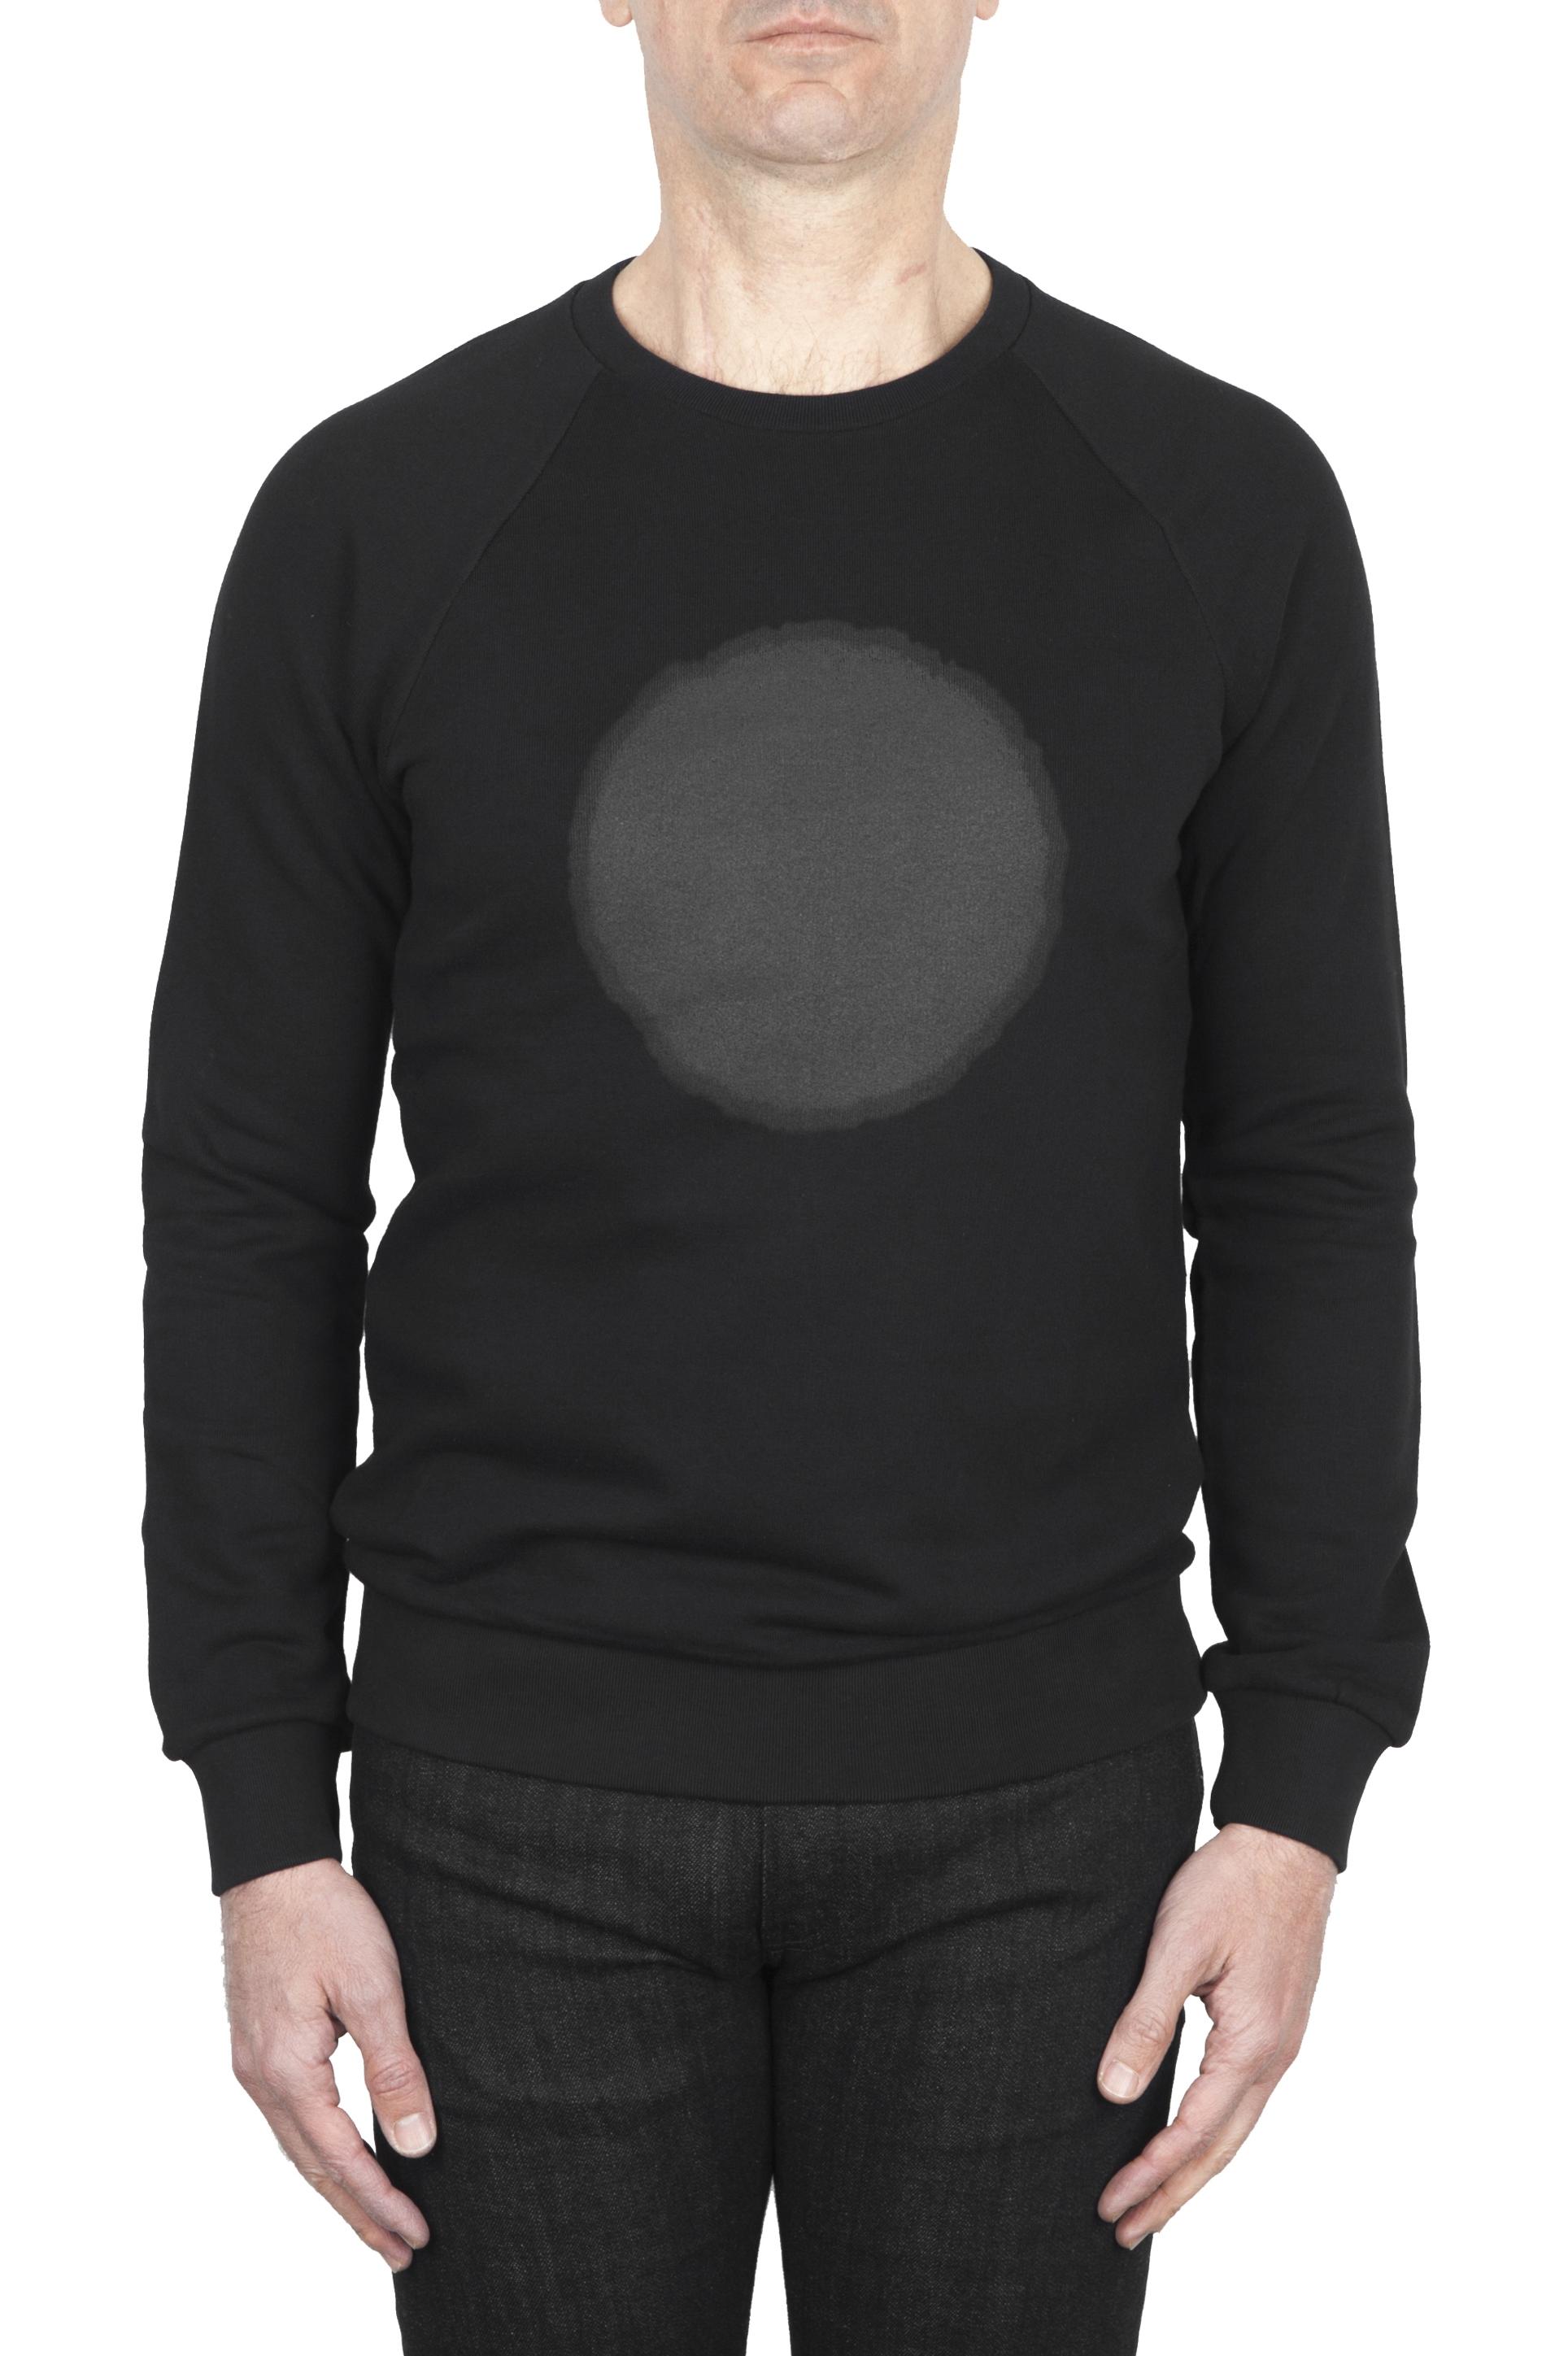 SBU 01797_19AW Hand printed crewneck black sweatshirt 01